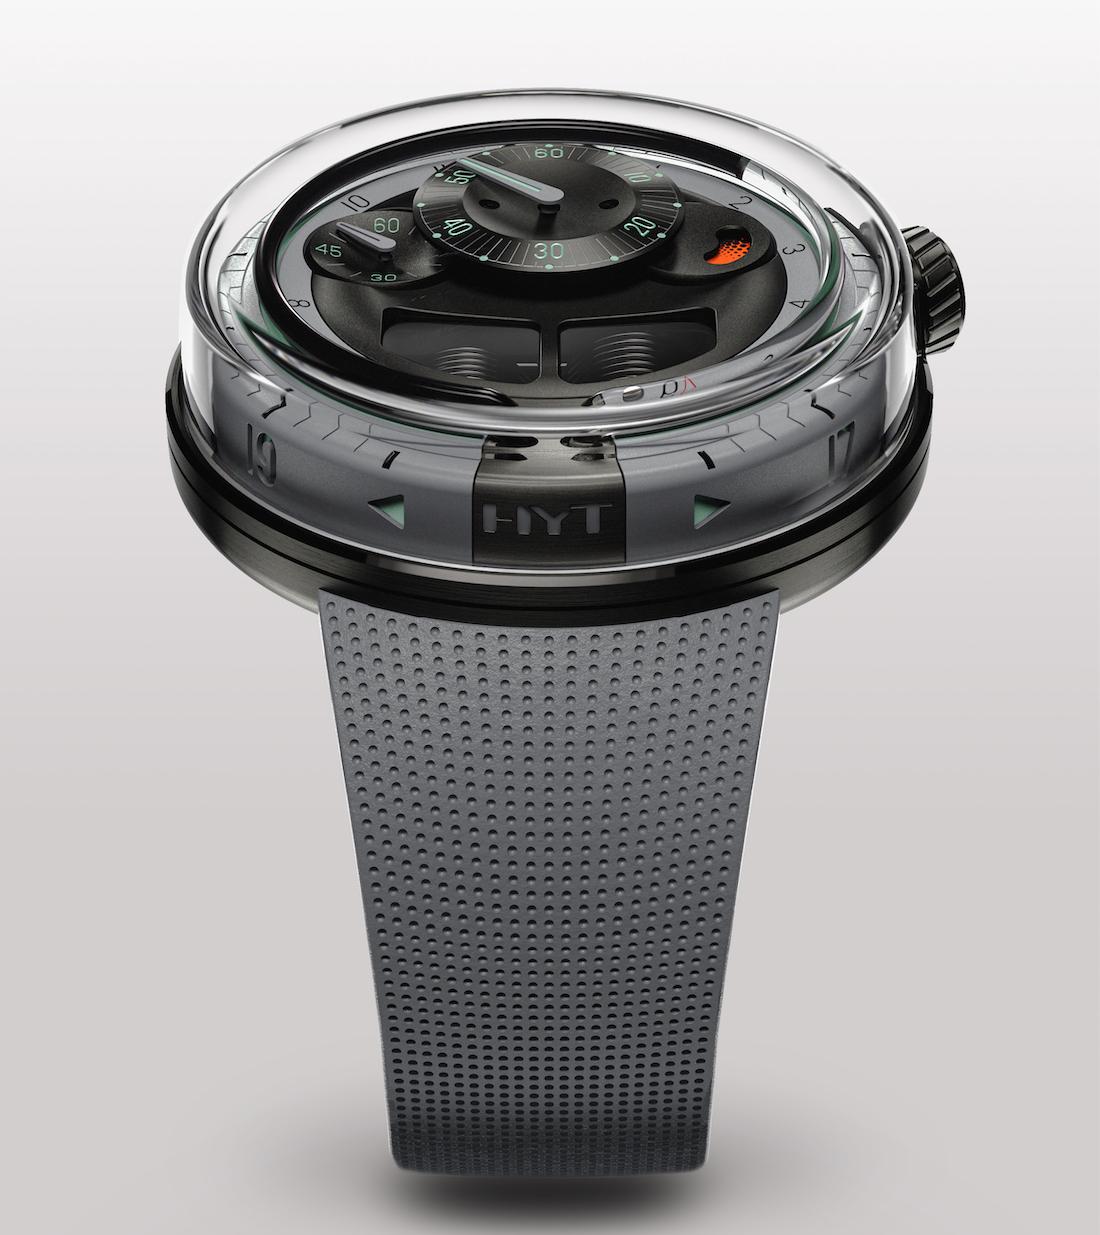 HYT-H0-Grey-FrontView-300dpi.jpg